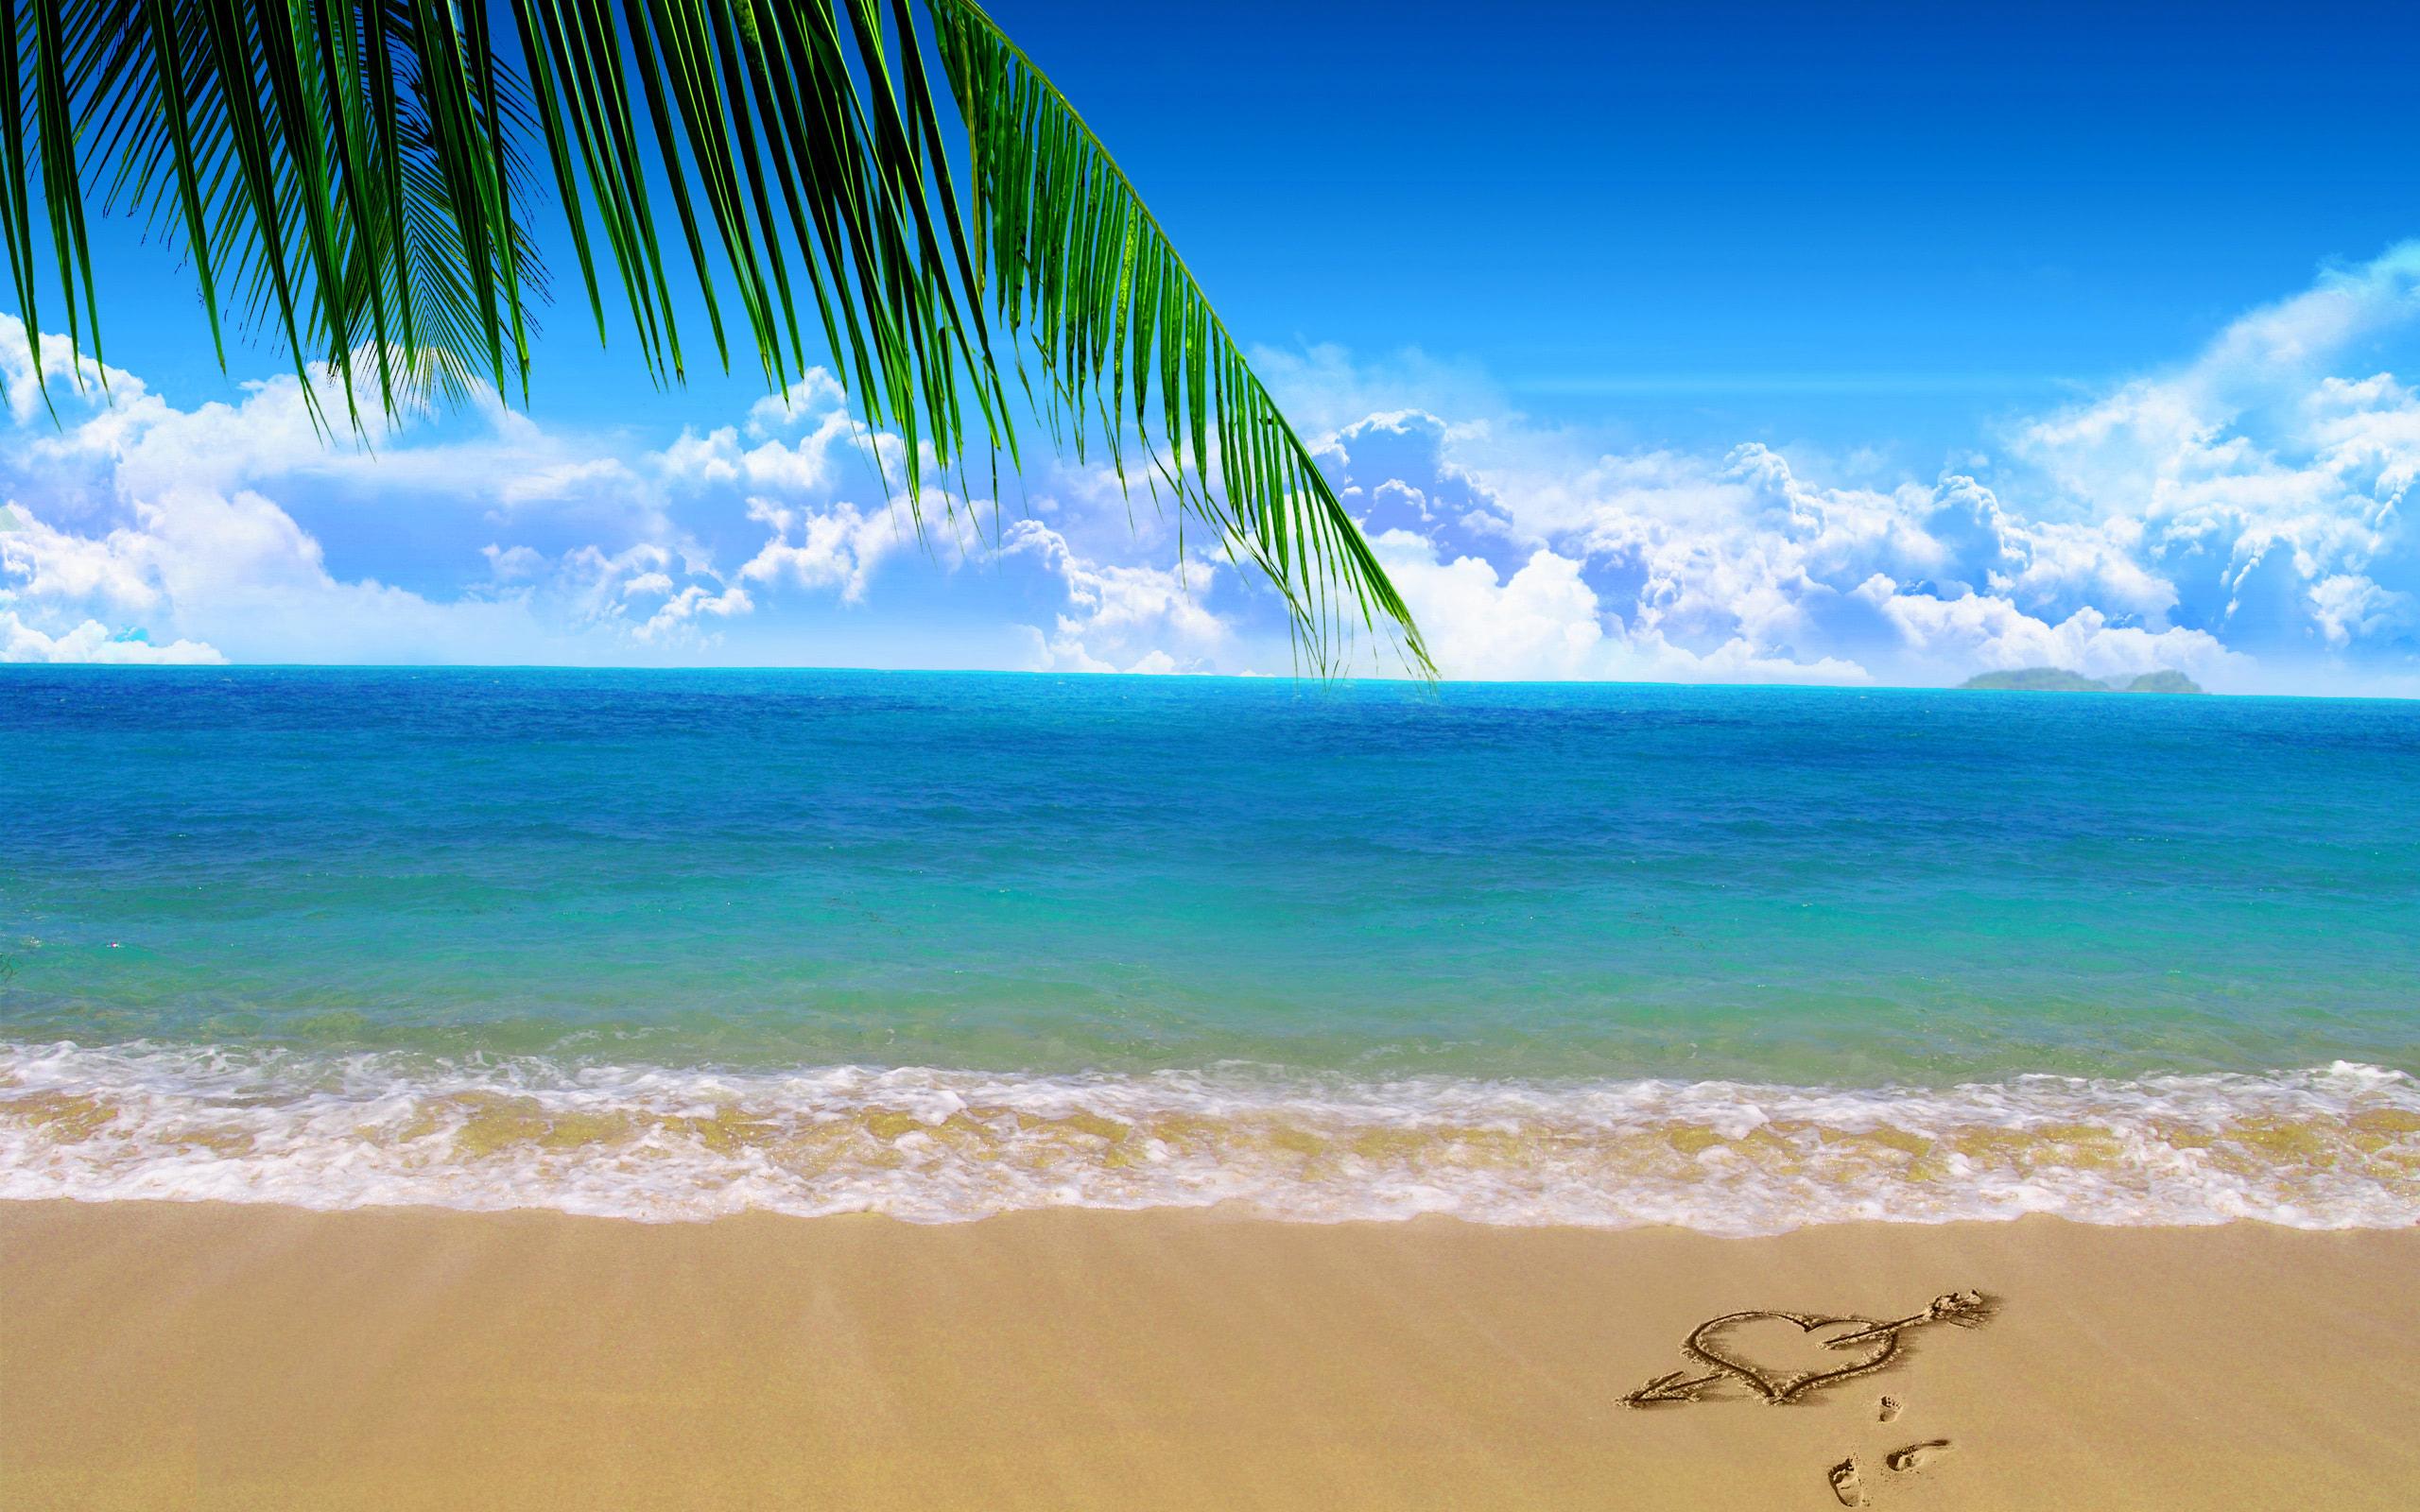 Love heart on beach sand - Beach Wallpapers